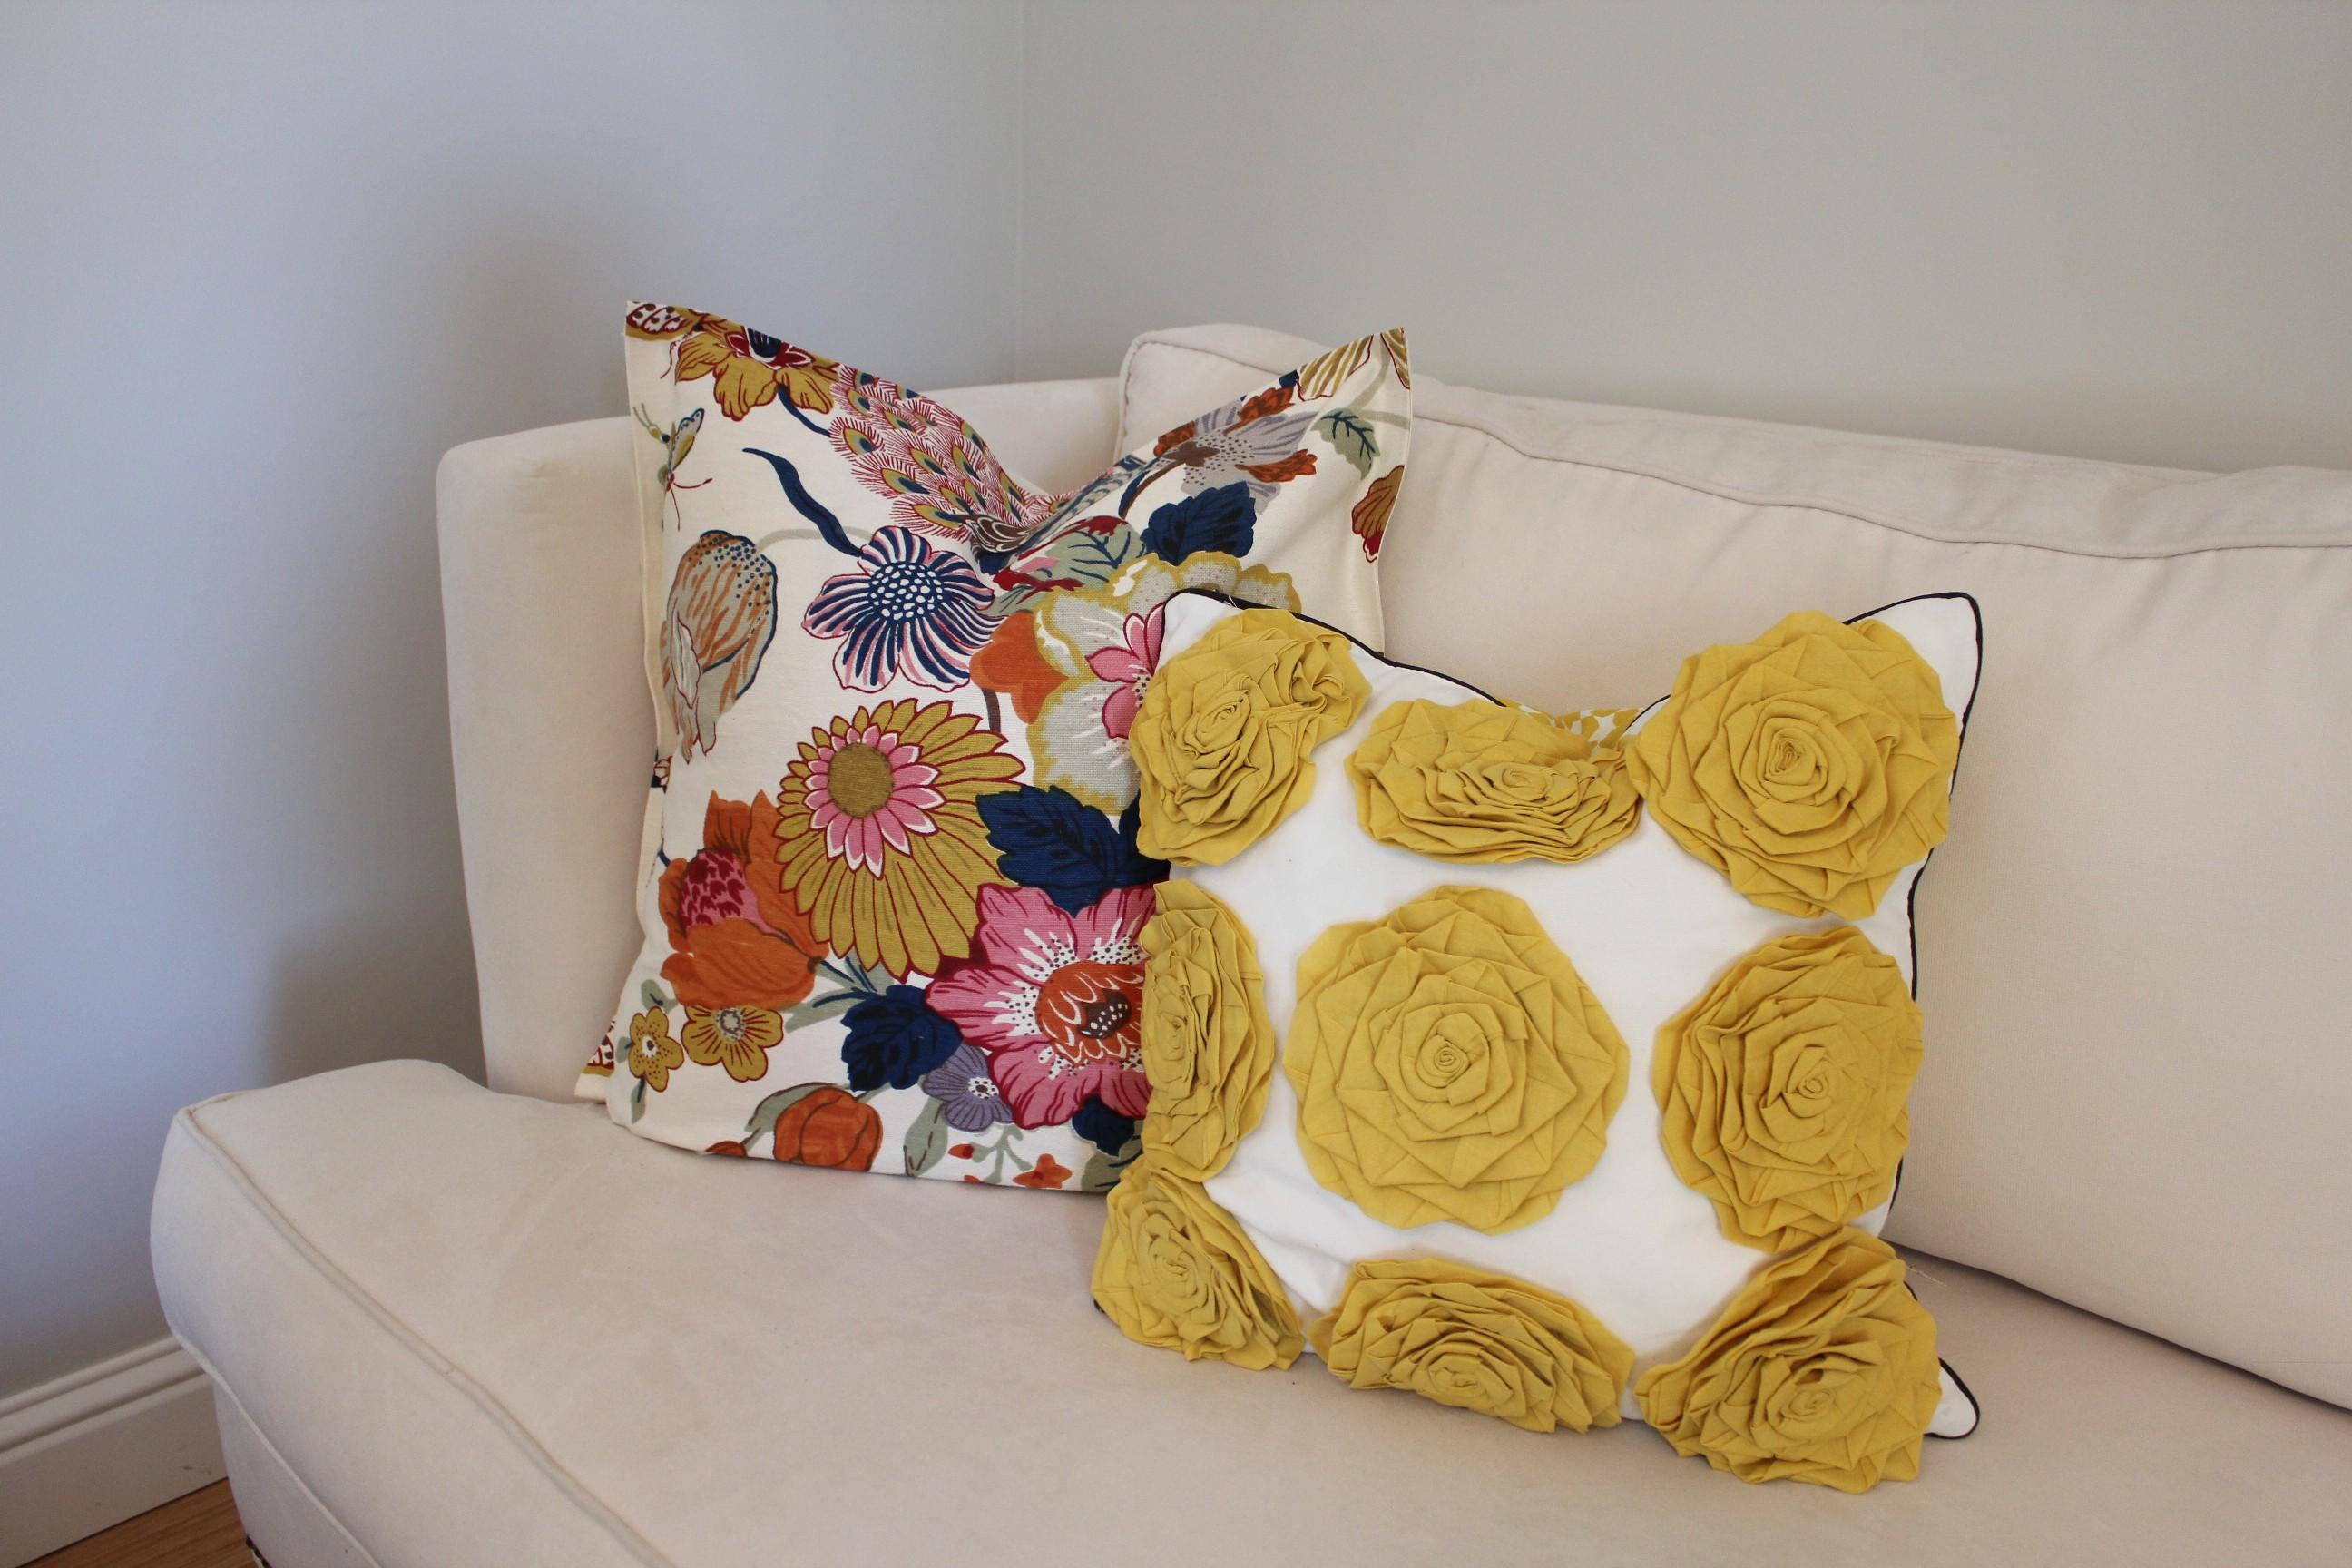 diy no sew pillow 346 living. Black Bedroom Furniture Sets. Home Design Ideas